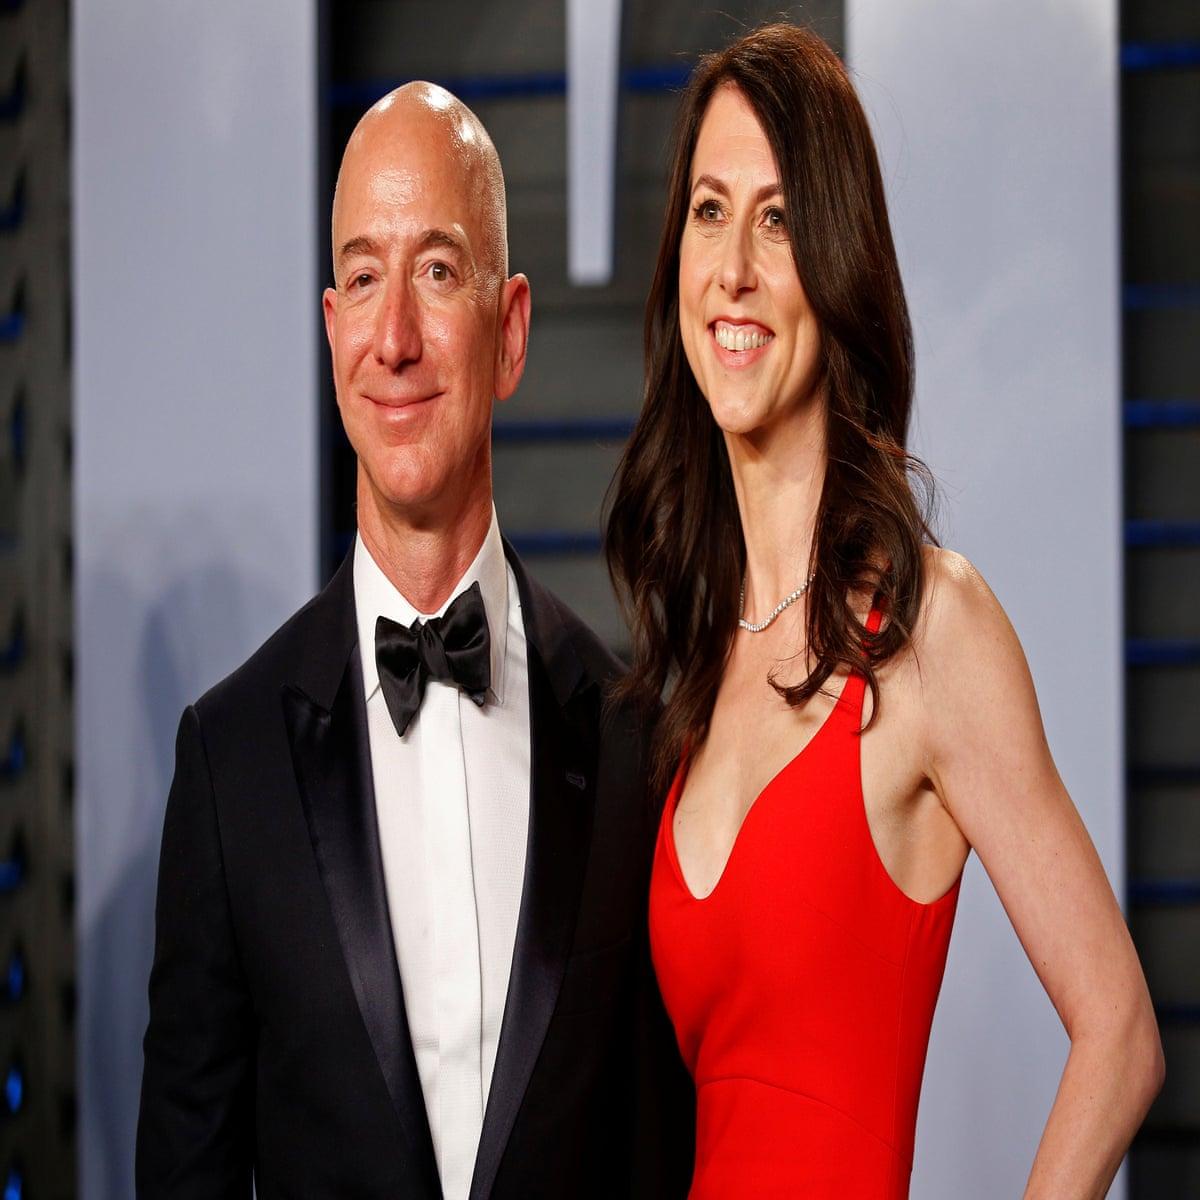 Amazon boss Jeff Bezos and wife MacKenzie to divorce  5c13a5a3999